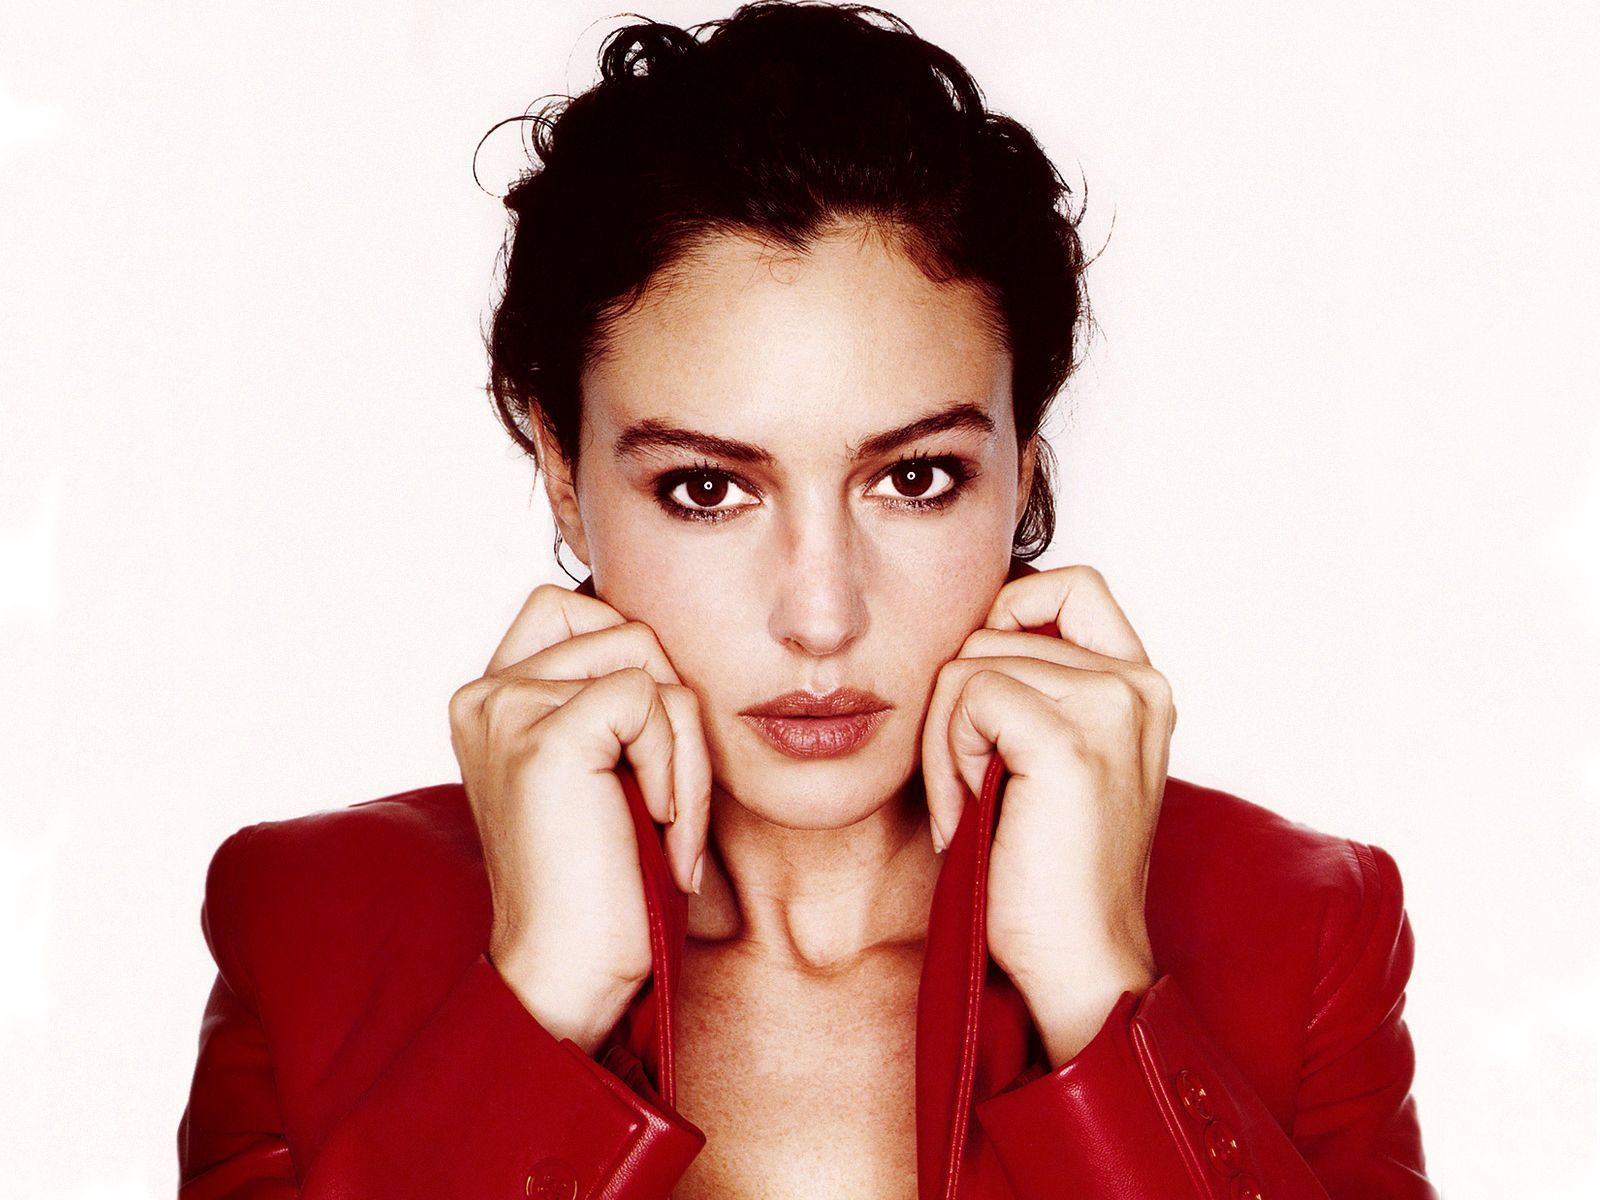 Monica Bellucci - Moni... Monica Bellucci